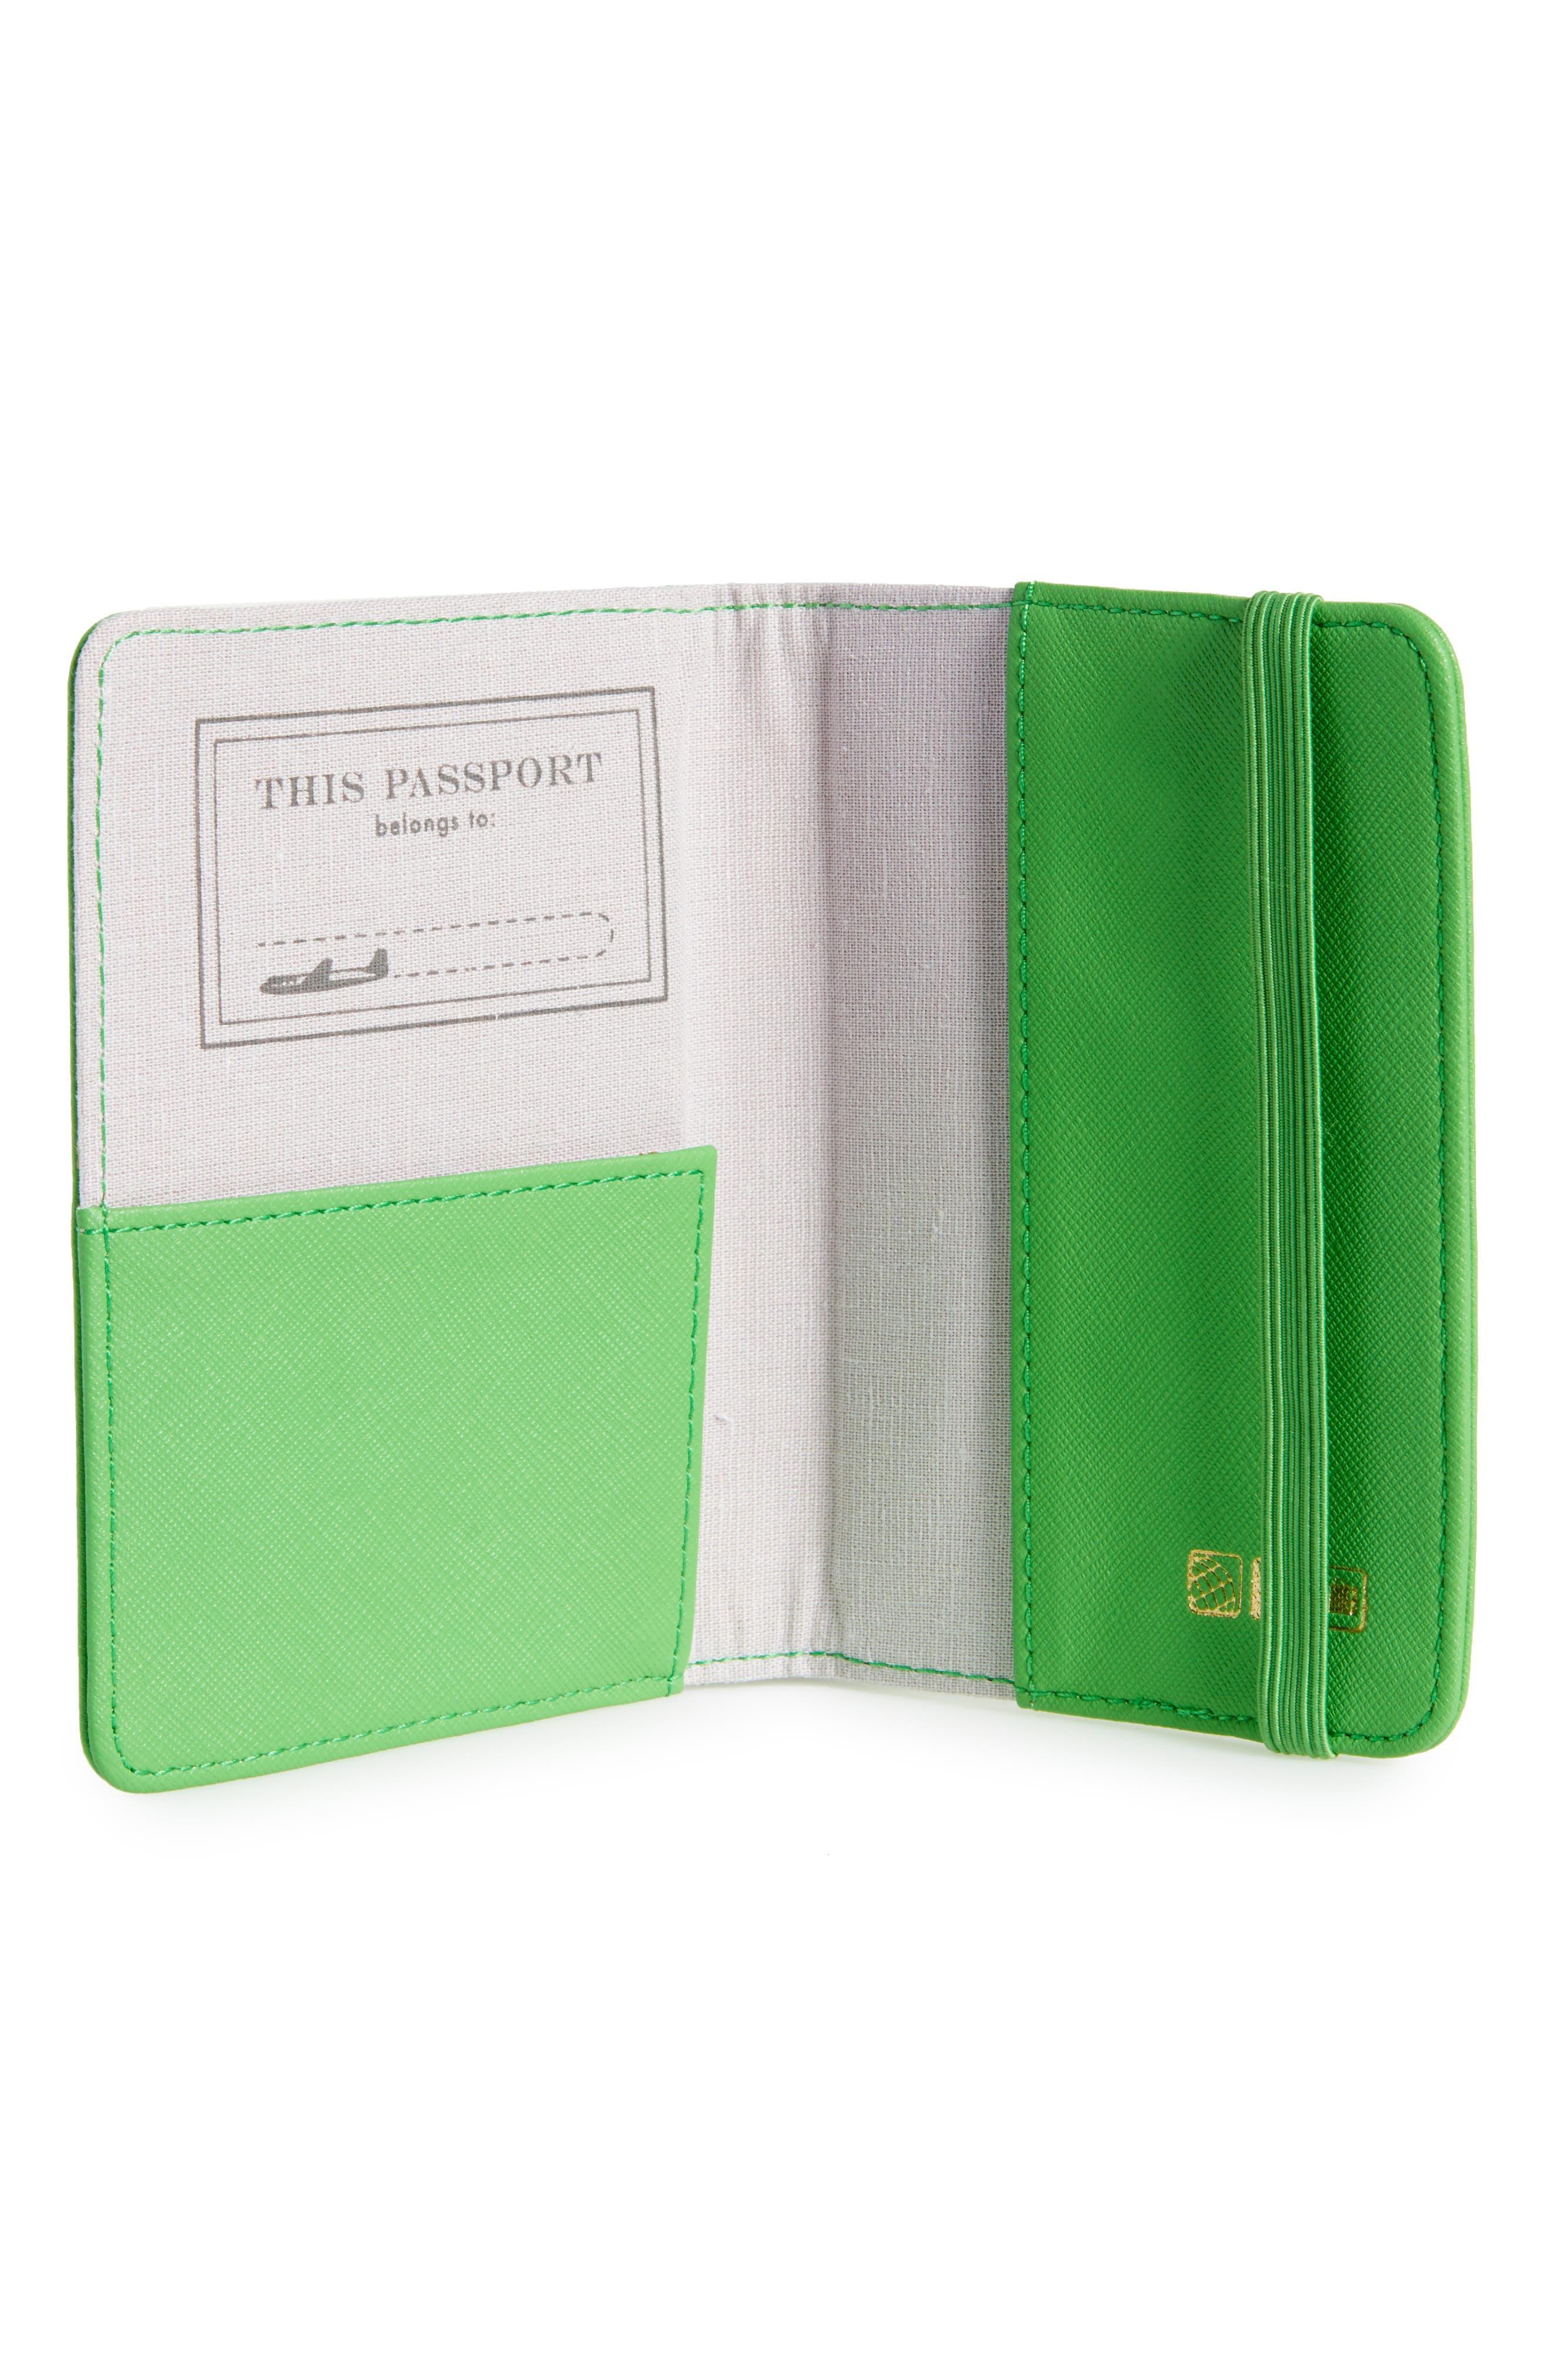 Correspondent Passport Cover,                             Alternate thumbnail 2, color,                             Green